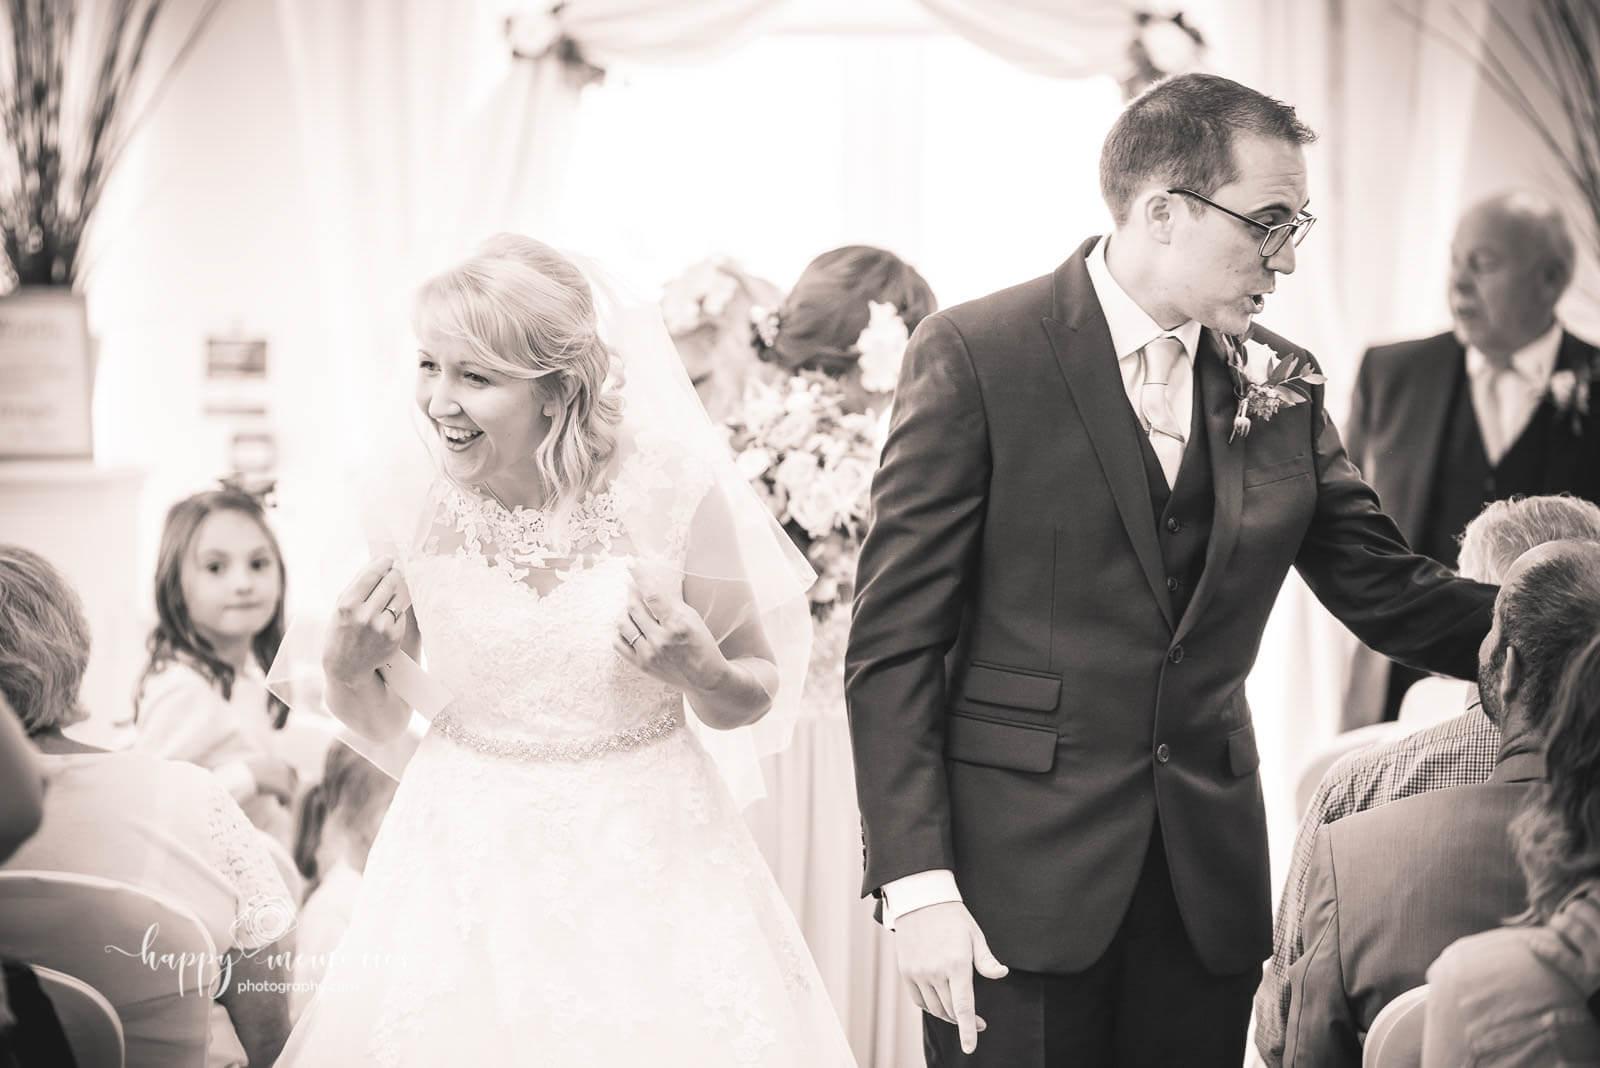 Wedding photographer East Grinstead-27